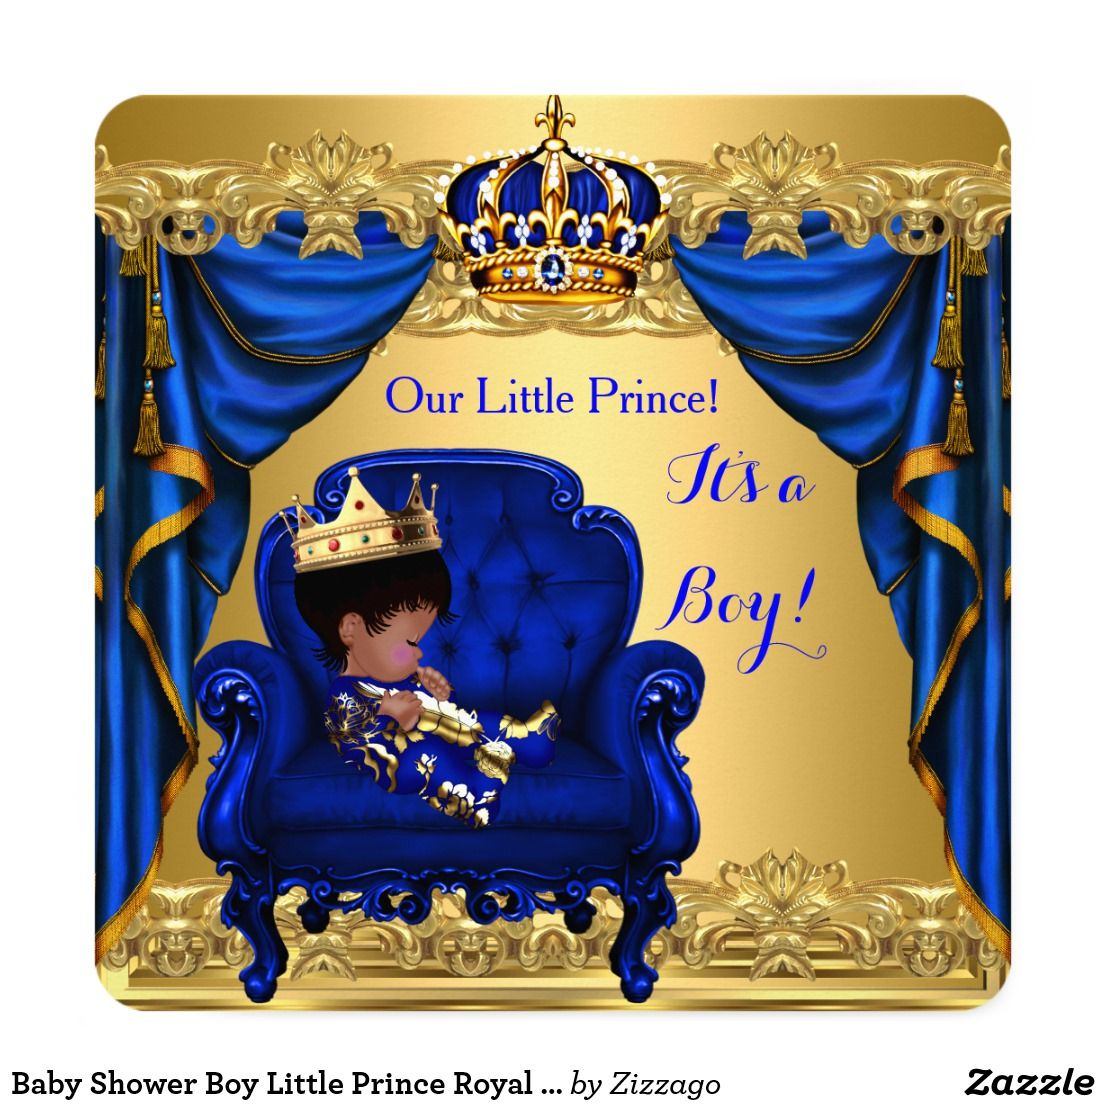 baby shower boy little prince royal blue golden card | boys, Baby shower invitations